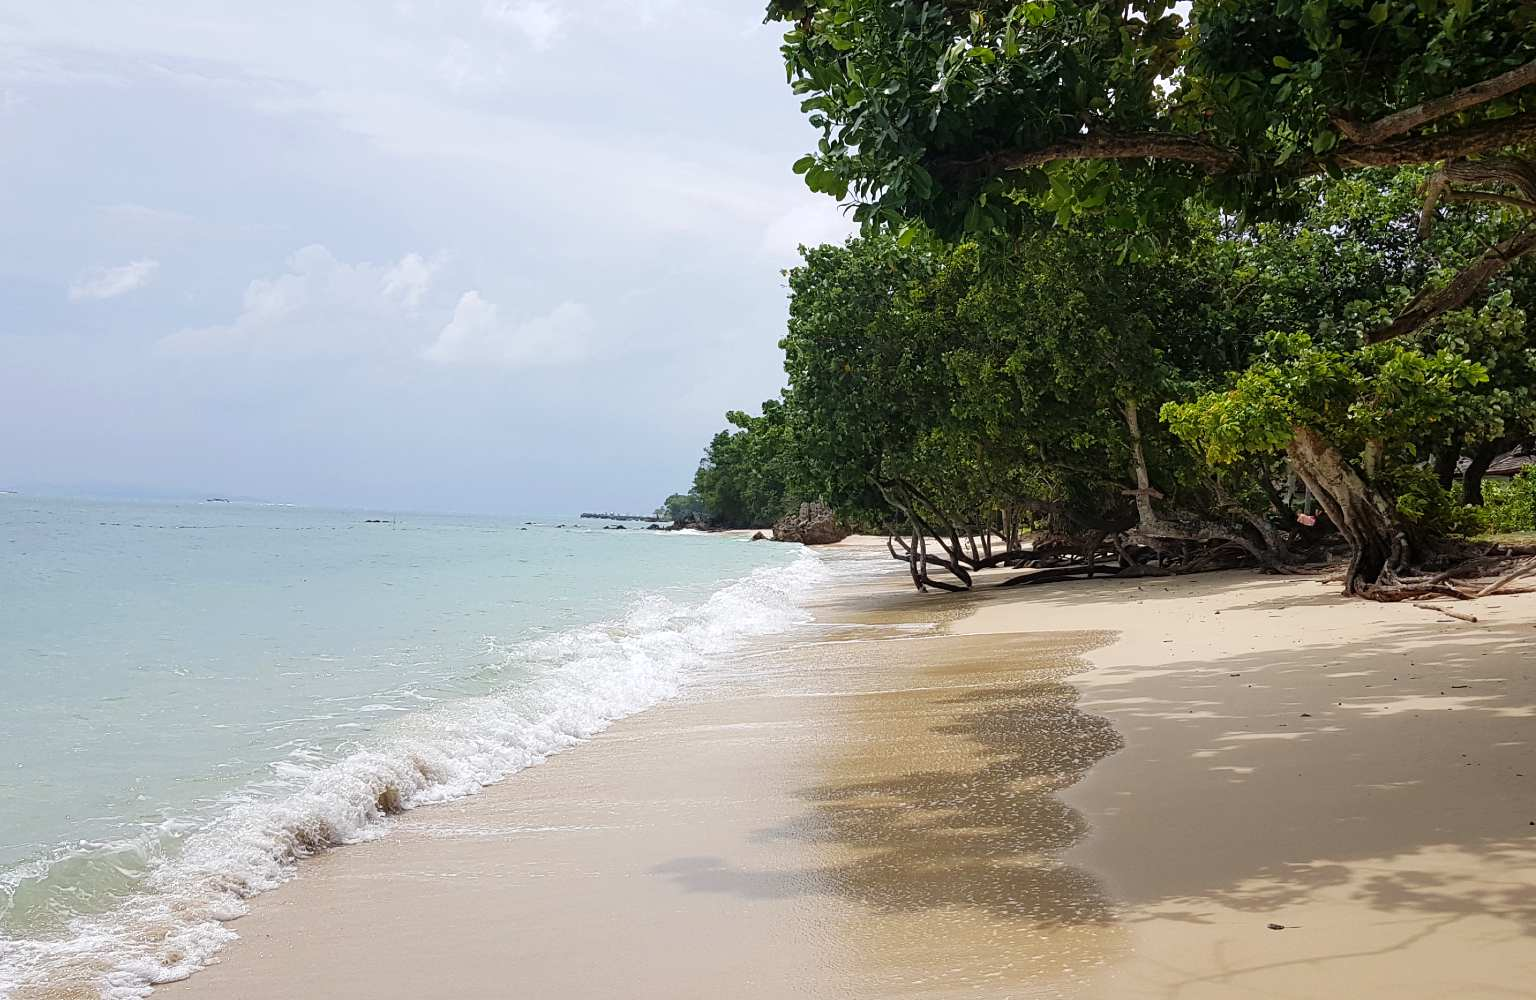 Koh Yao Yai beaches Ao Muong Beach